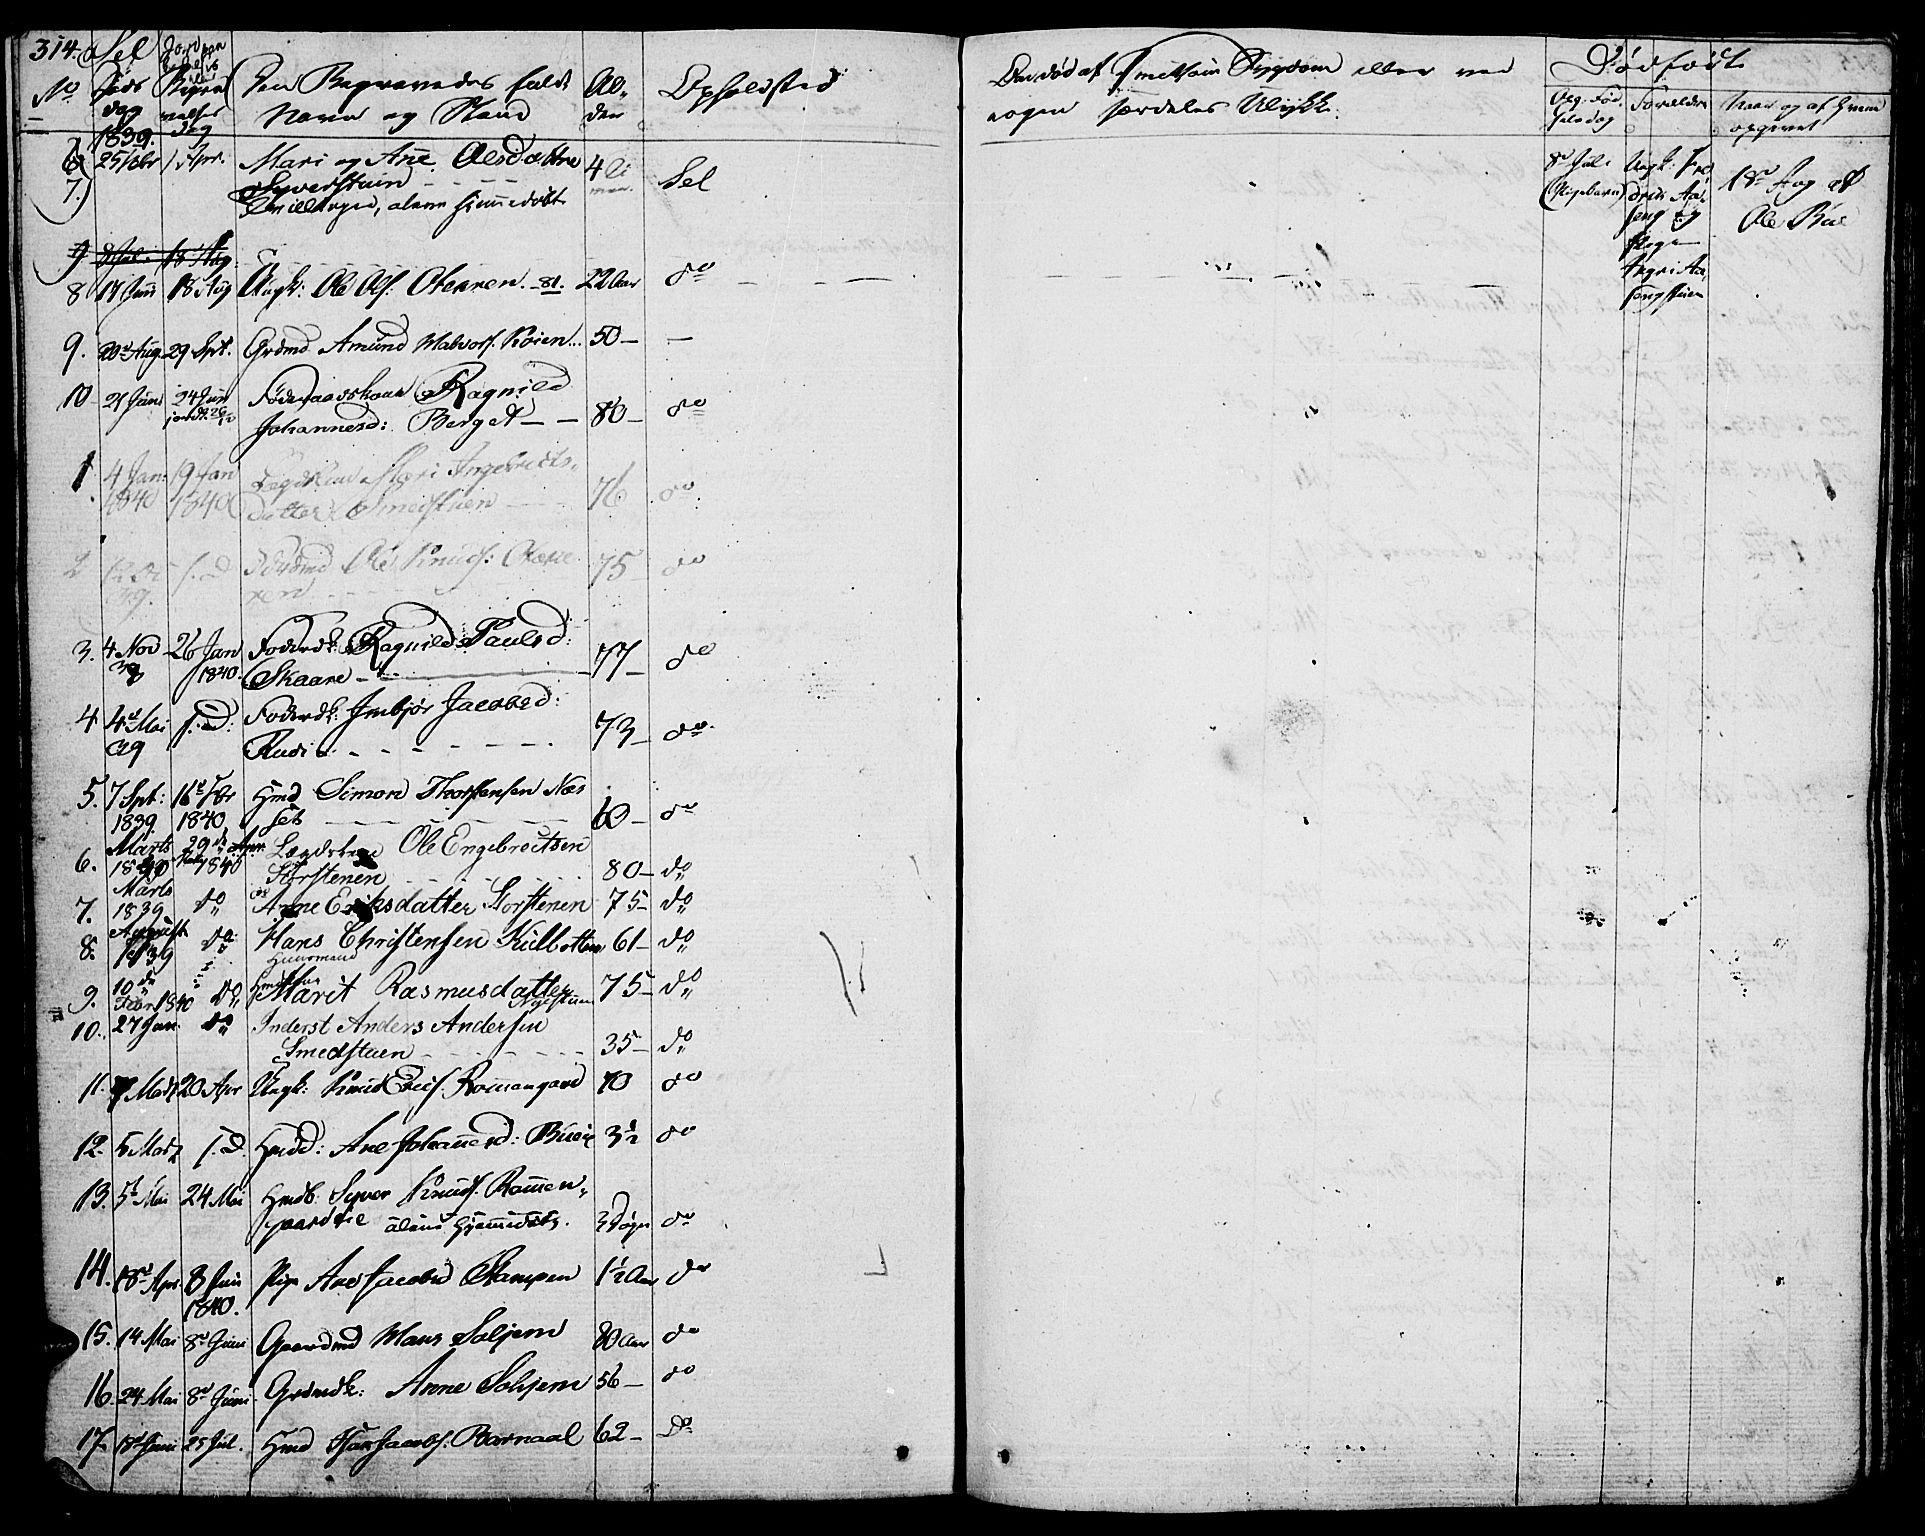 SAH, Vågå prestekontor, Ministerialbok nr. 4 /3, 1834-1842, s. 314